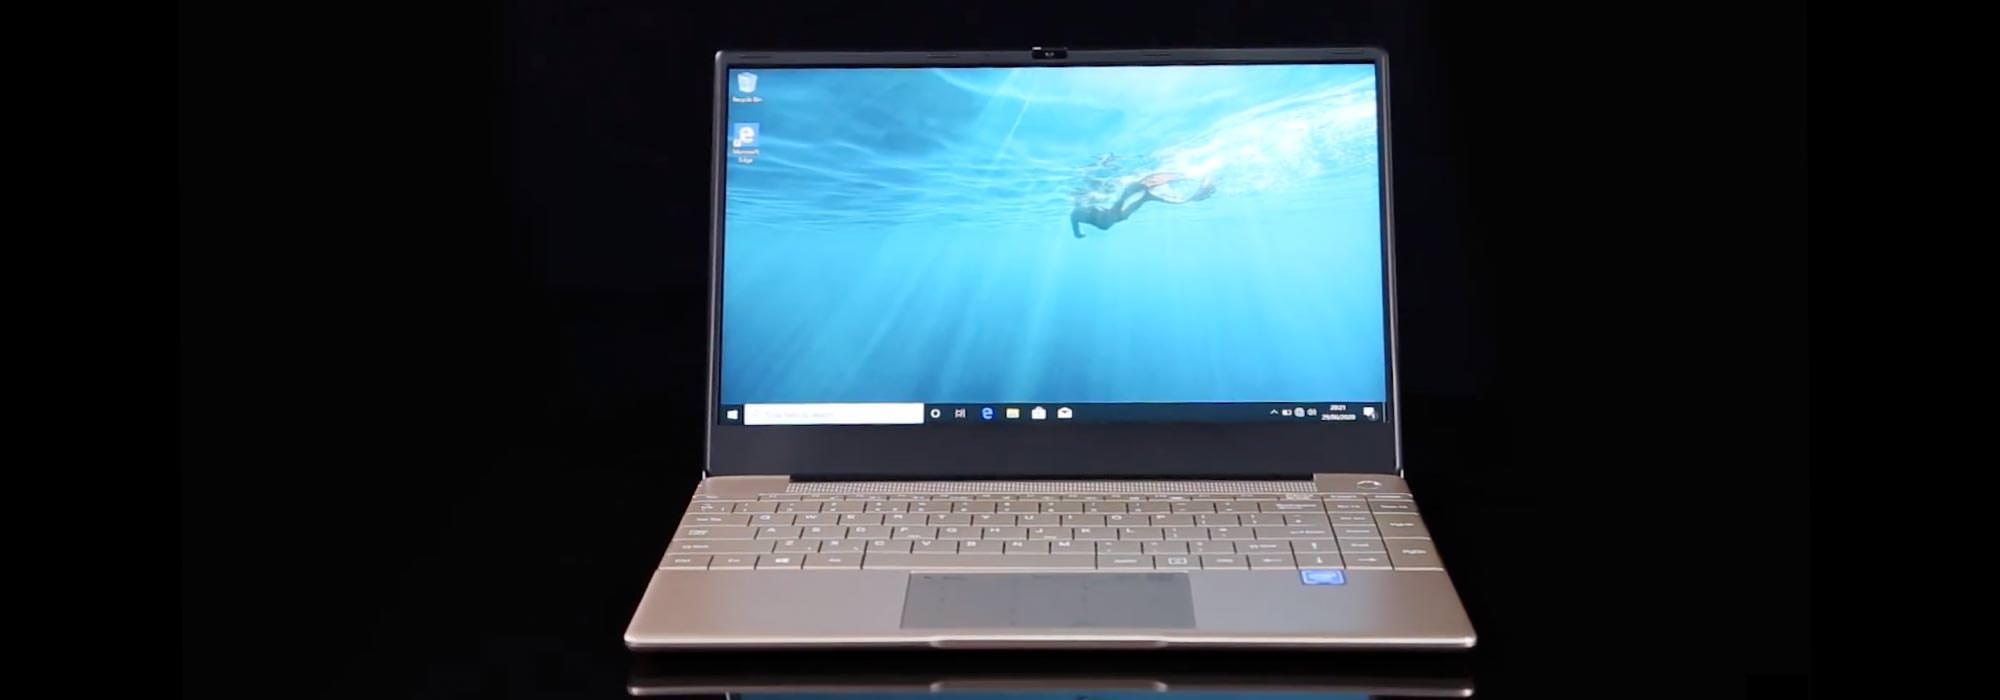 Sonderpreis: KUU K2 Laptop – Spezifikationen & mehr